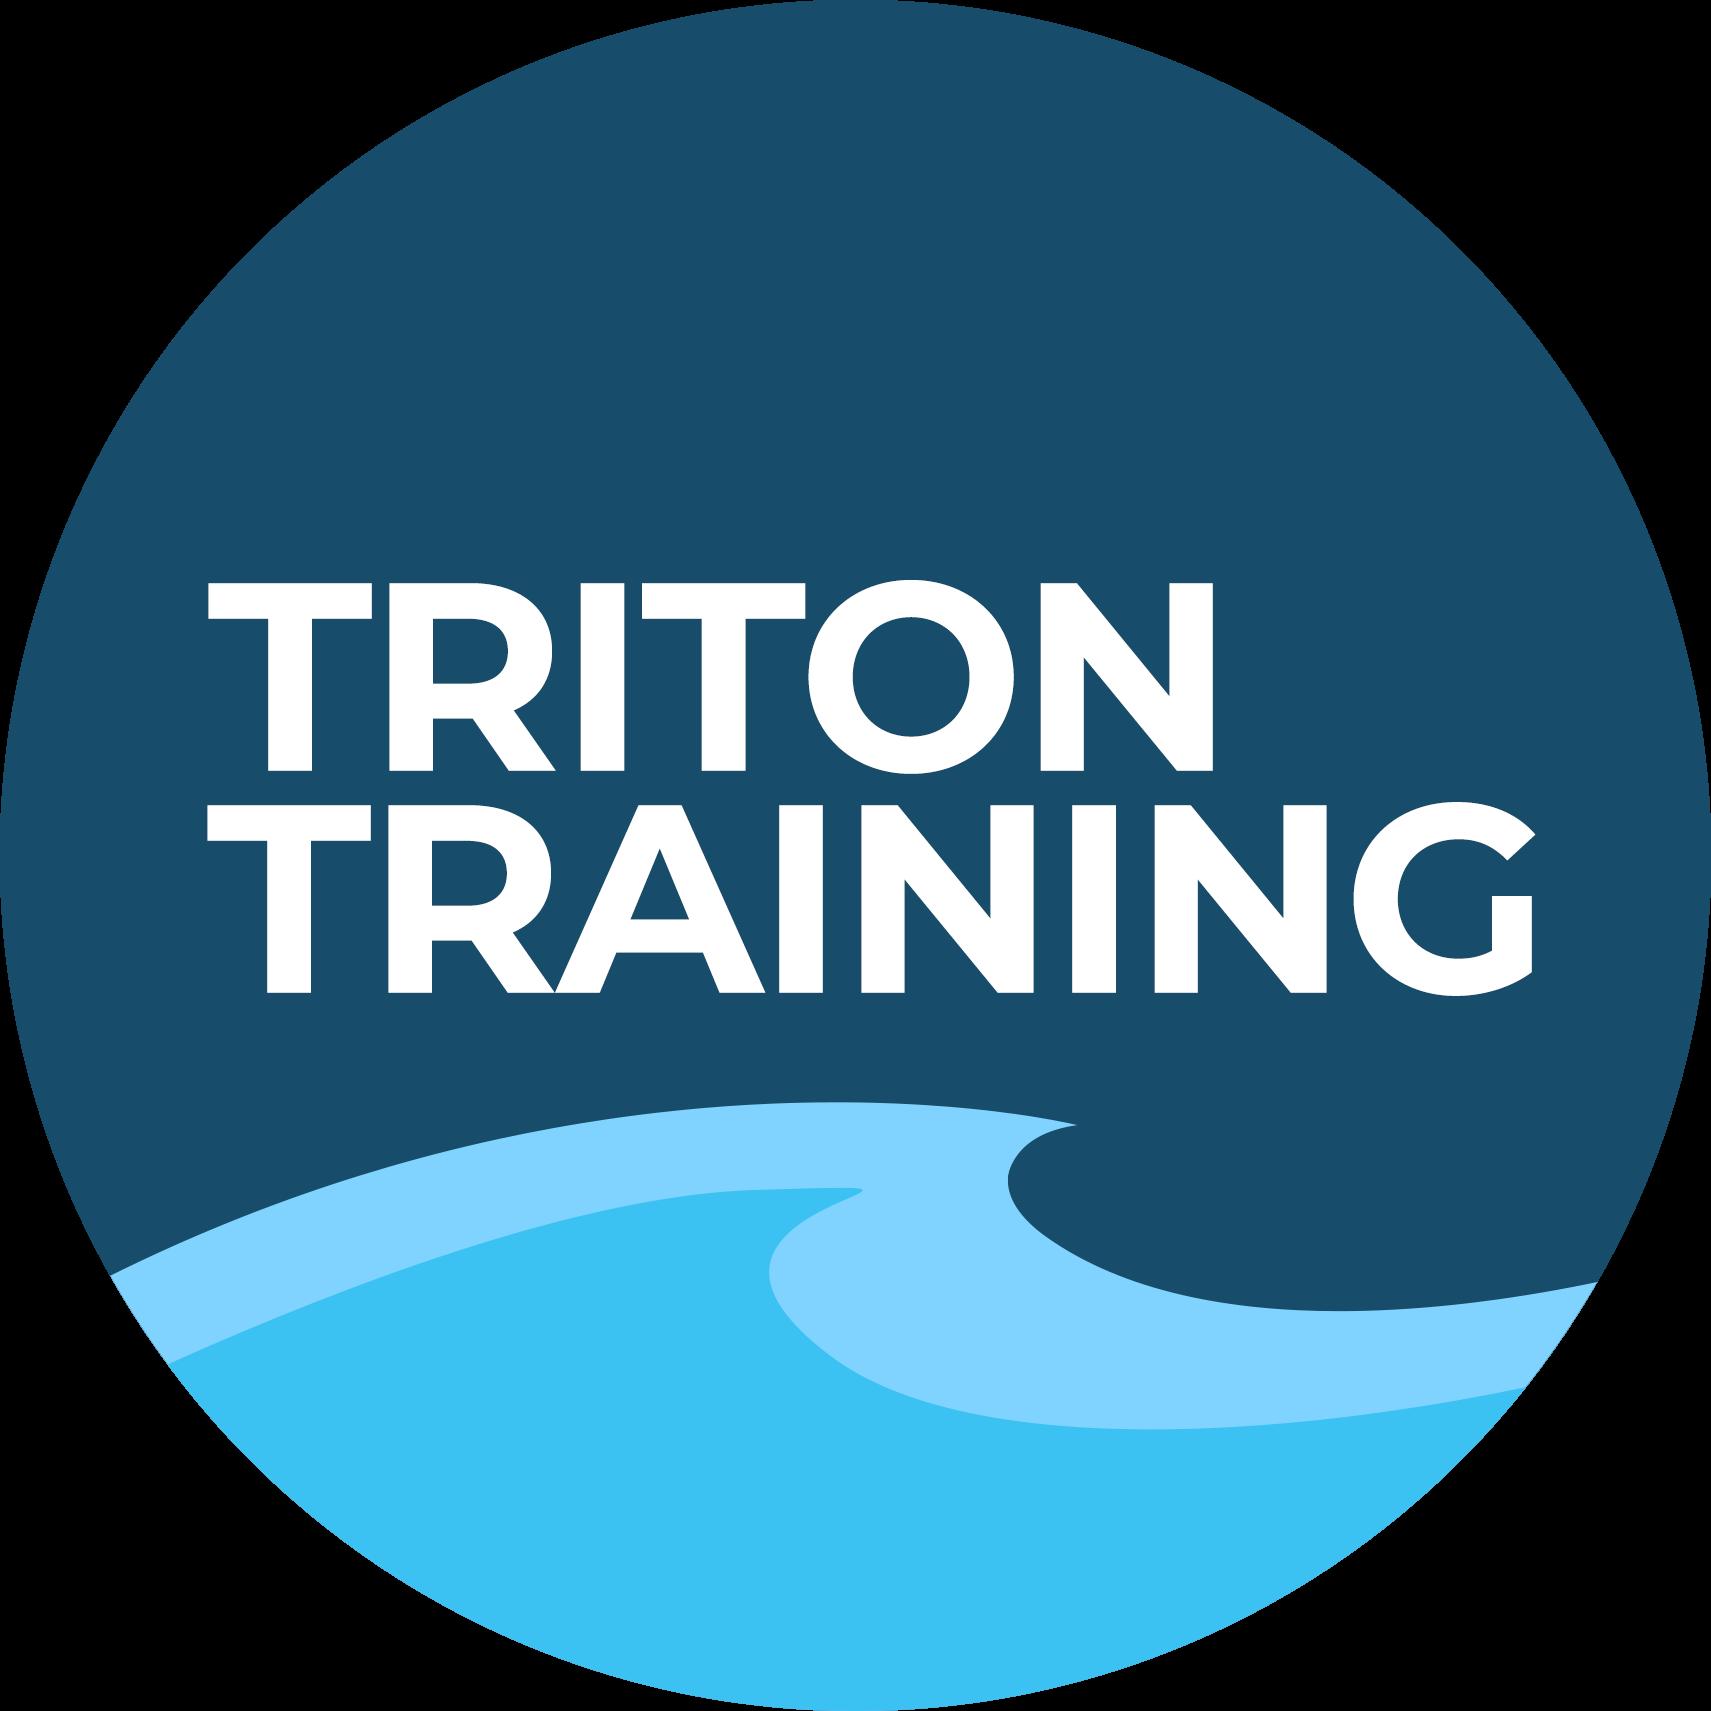 Triton Training